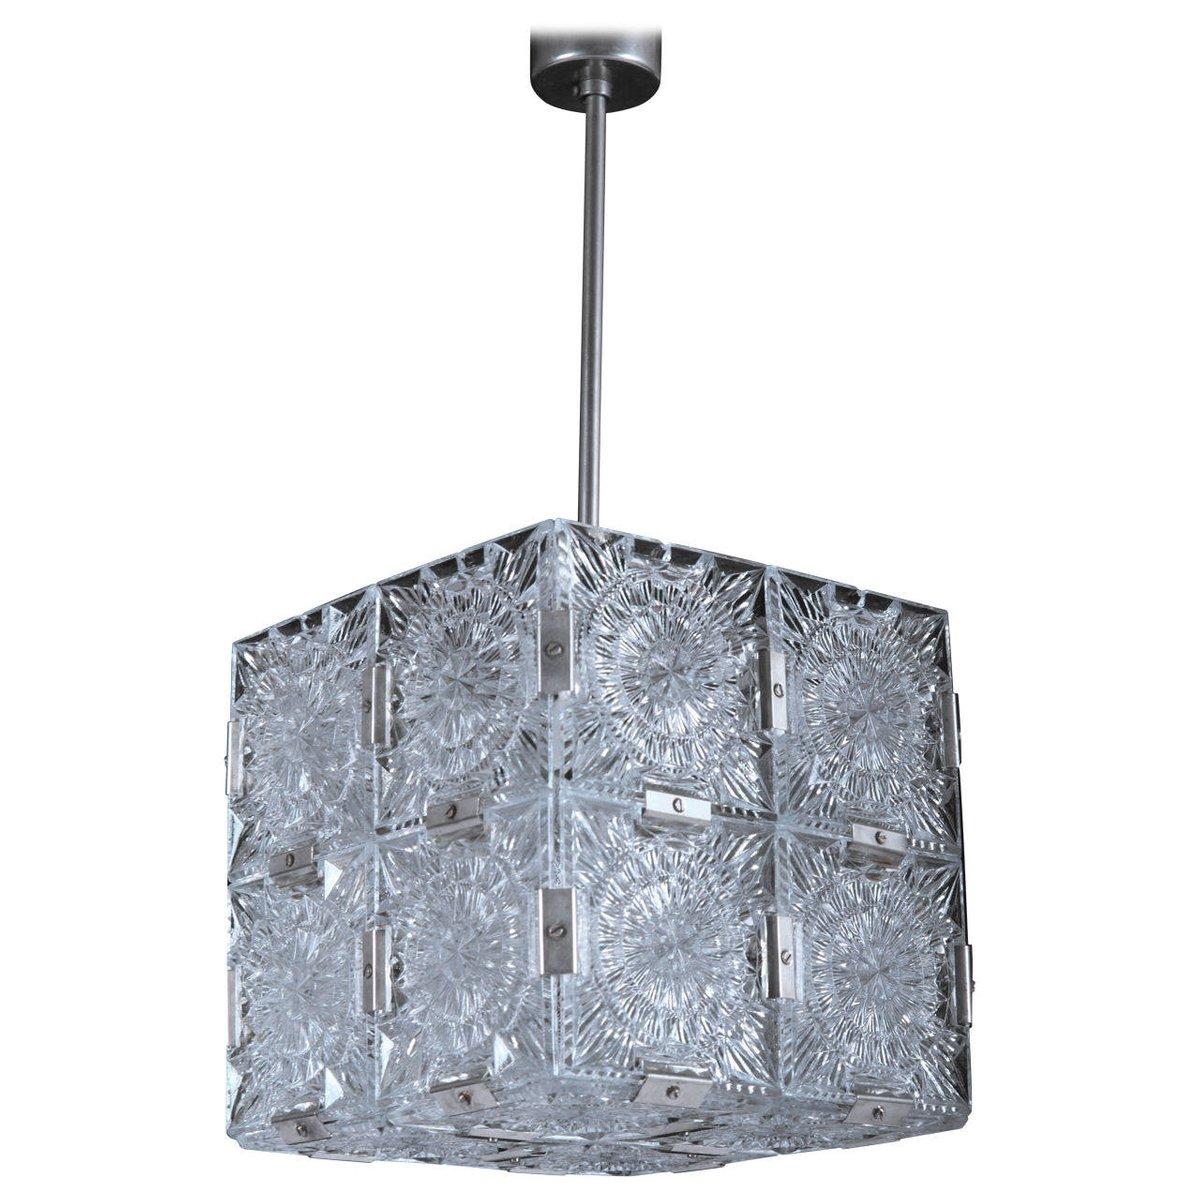 Mid Century Cube Pendant Light For Sale At Pamono